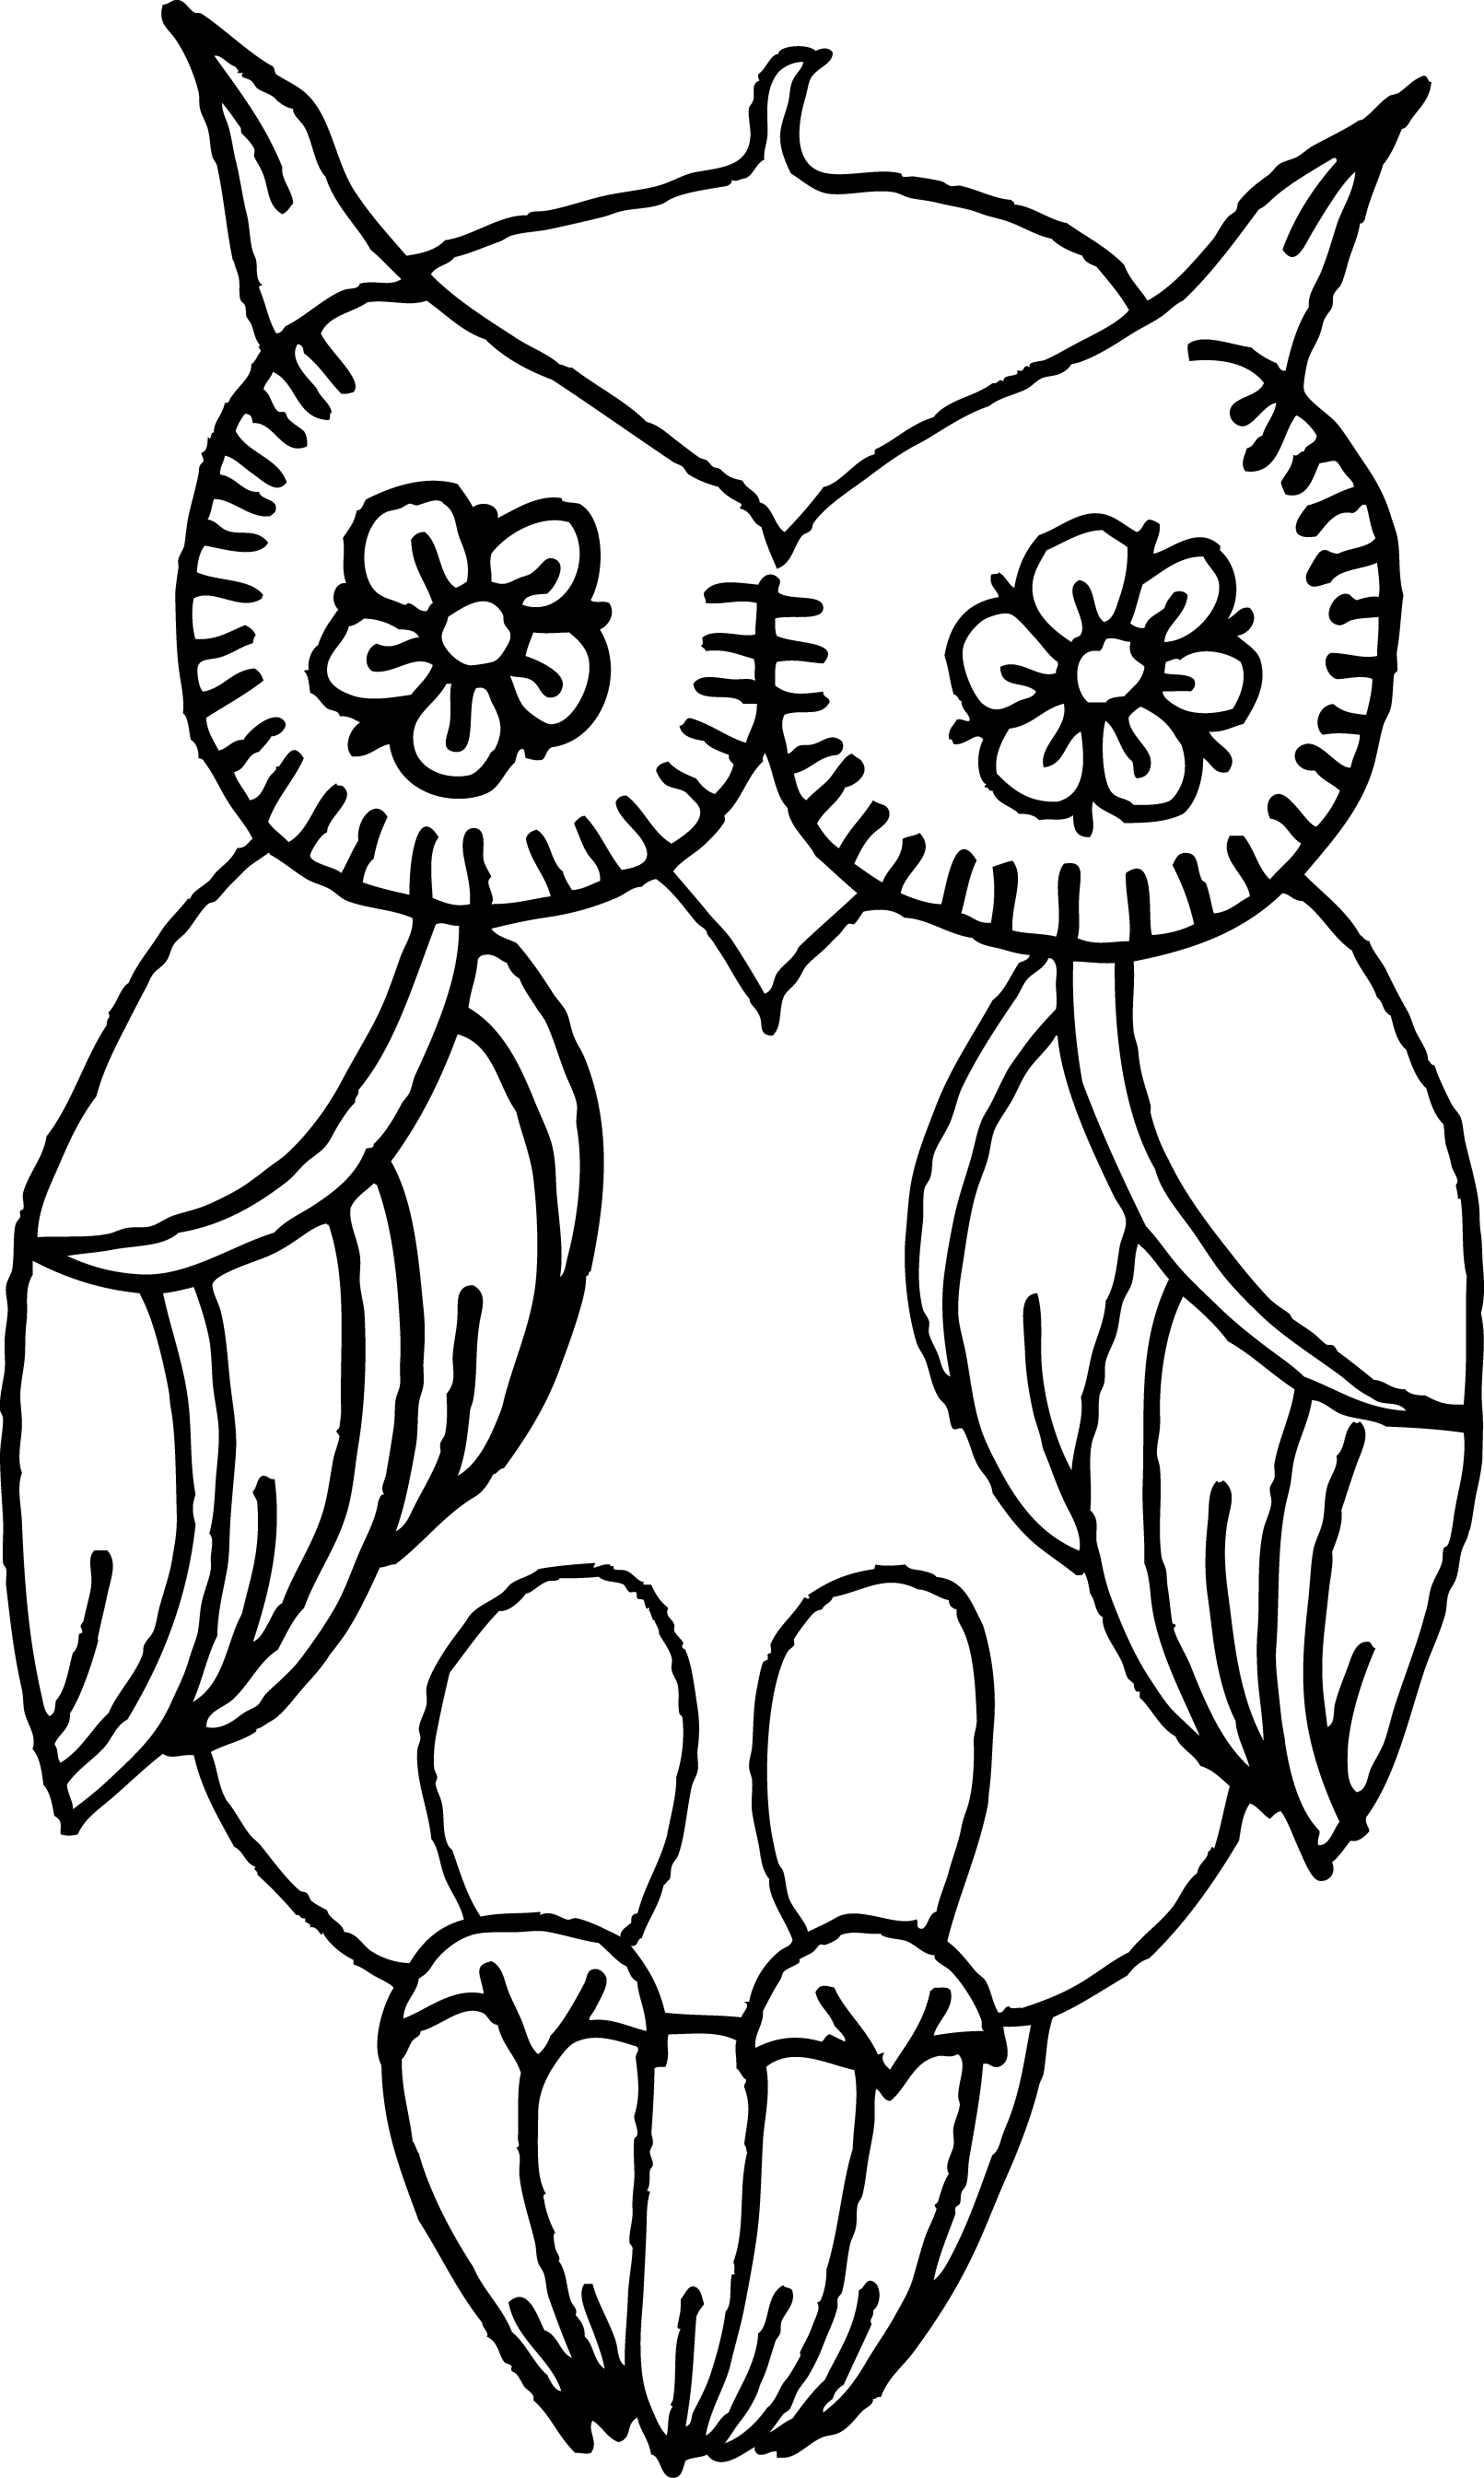 1611x2690 Sandpaper Spray Varnish Masking Tape Wood Sealer Copy Of Owl